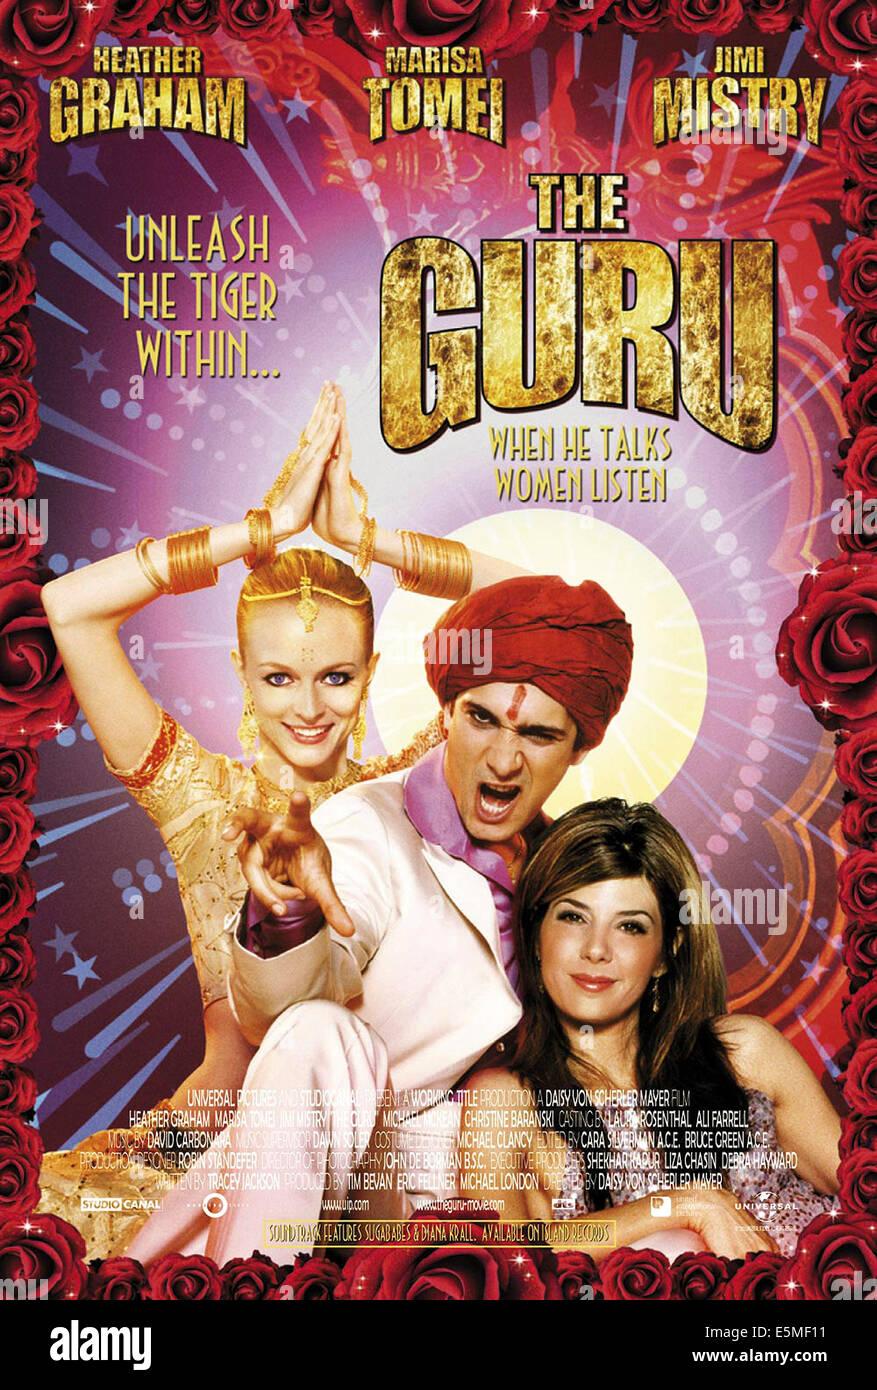 THE GURU, Heather Graham, Jimi Mistry, Marisa Tomei, 2002, (c) Universal/courtesy Everett Collection - Stock Image